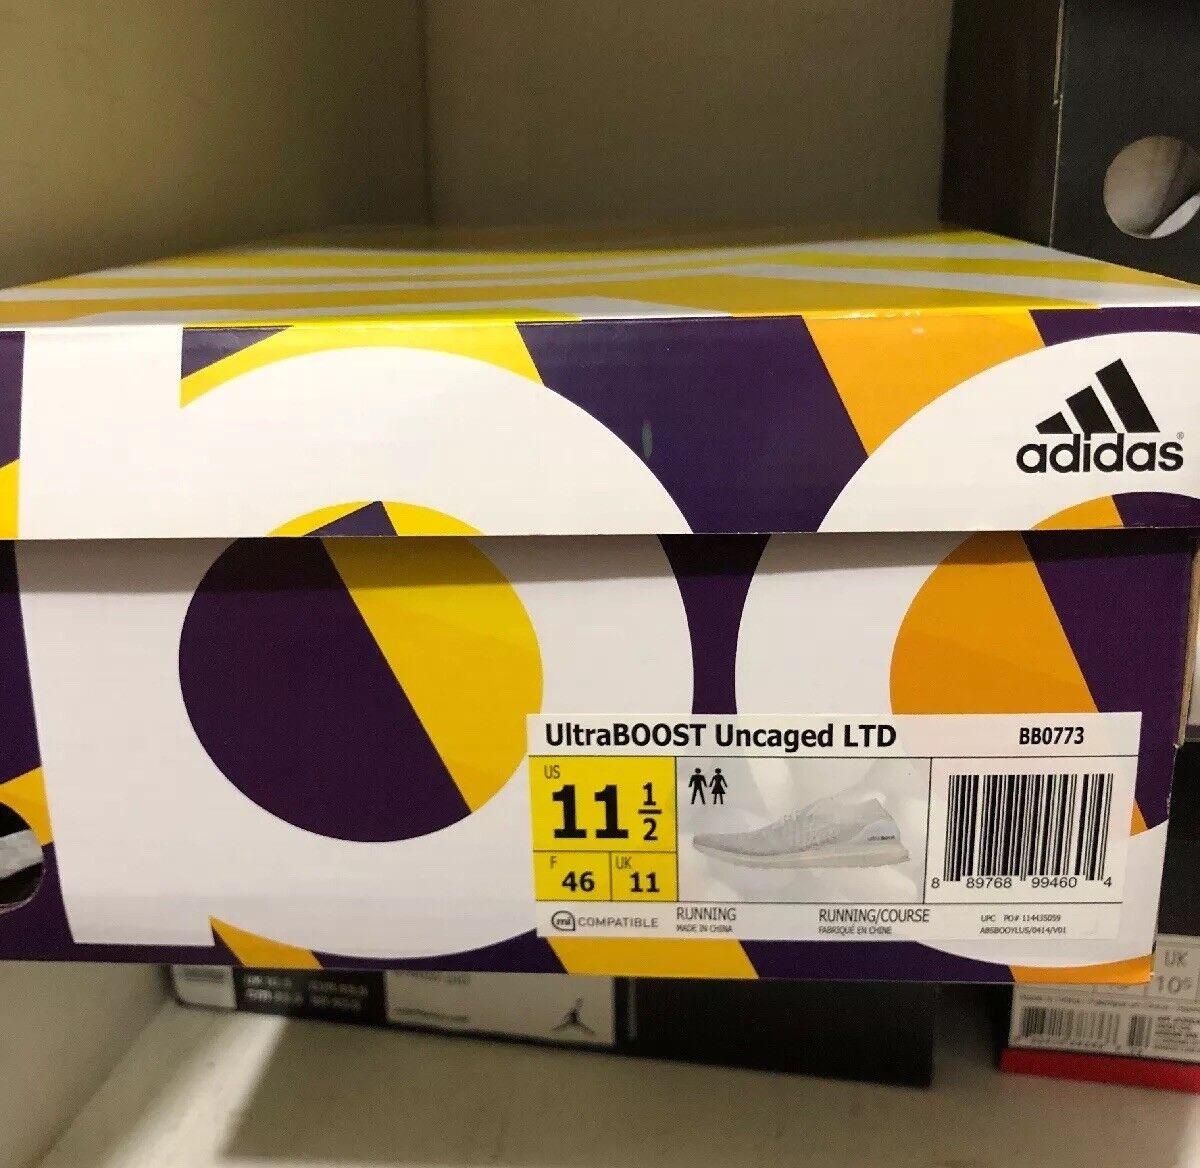 Adidas UltraBOOST Uncaged LTD Triple White (BB0773)